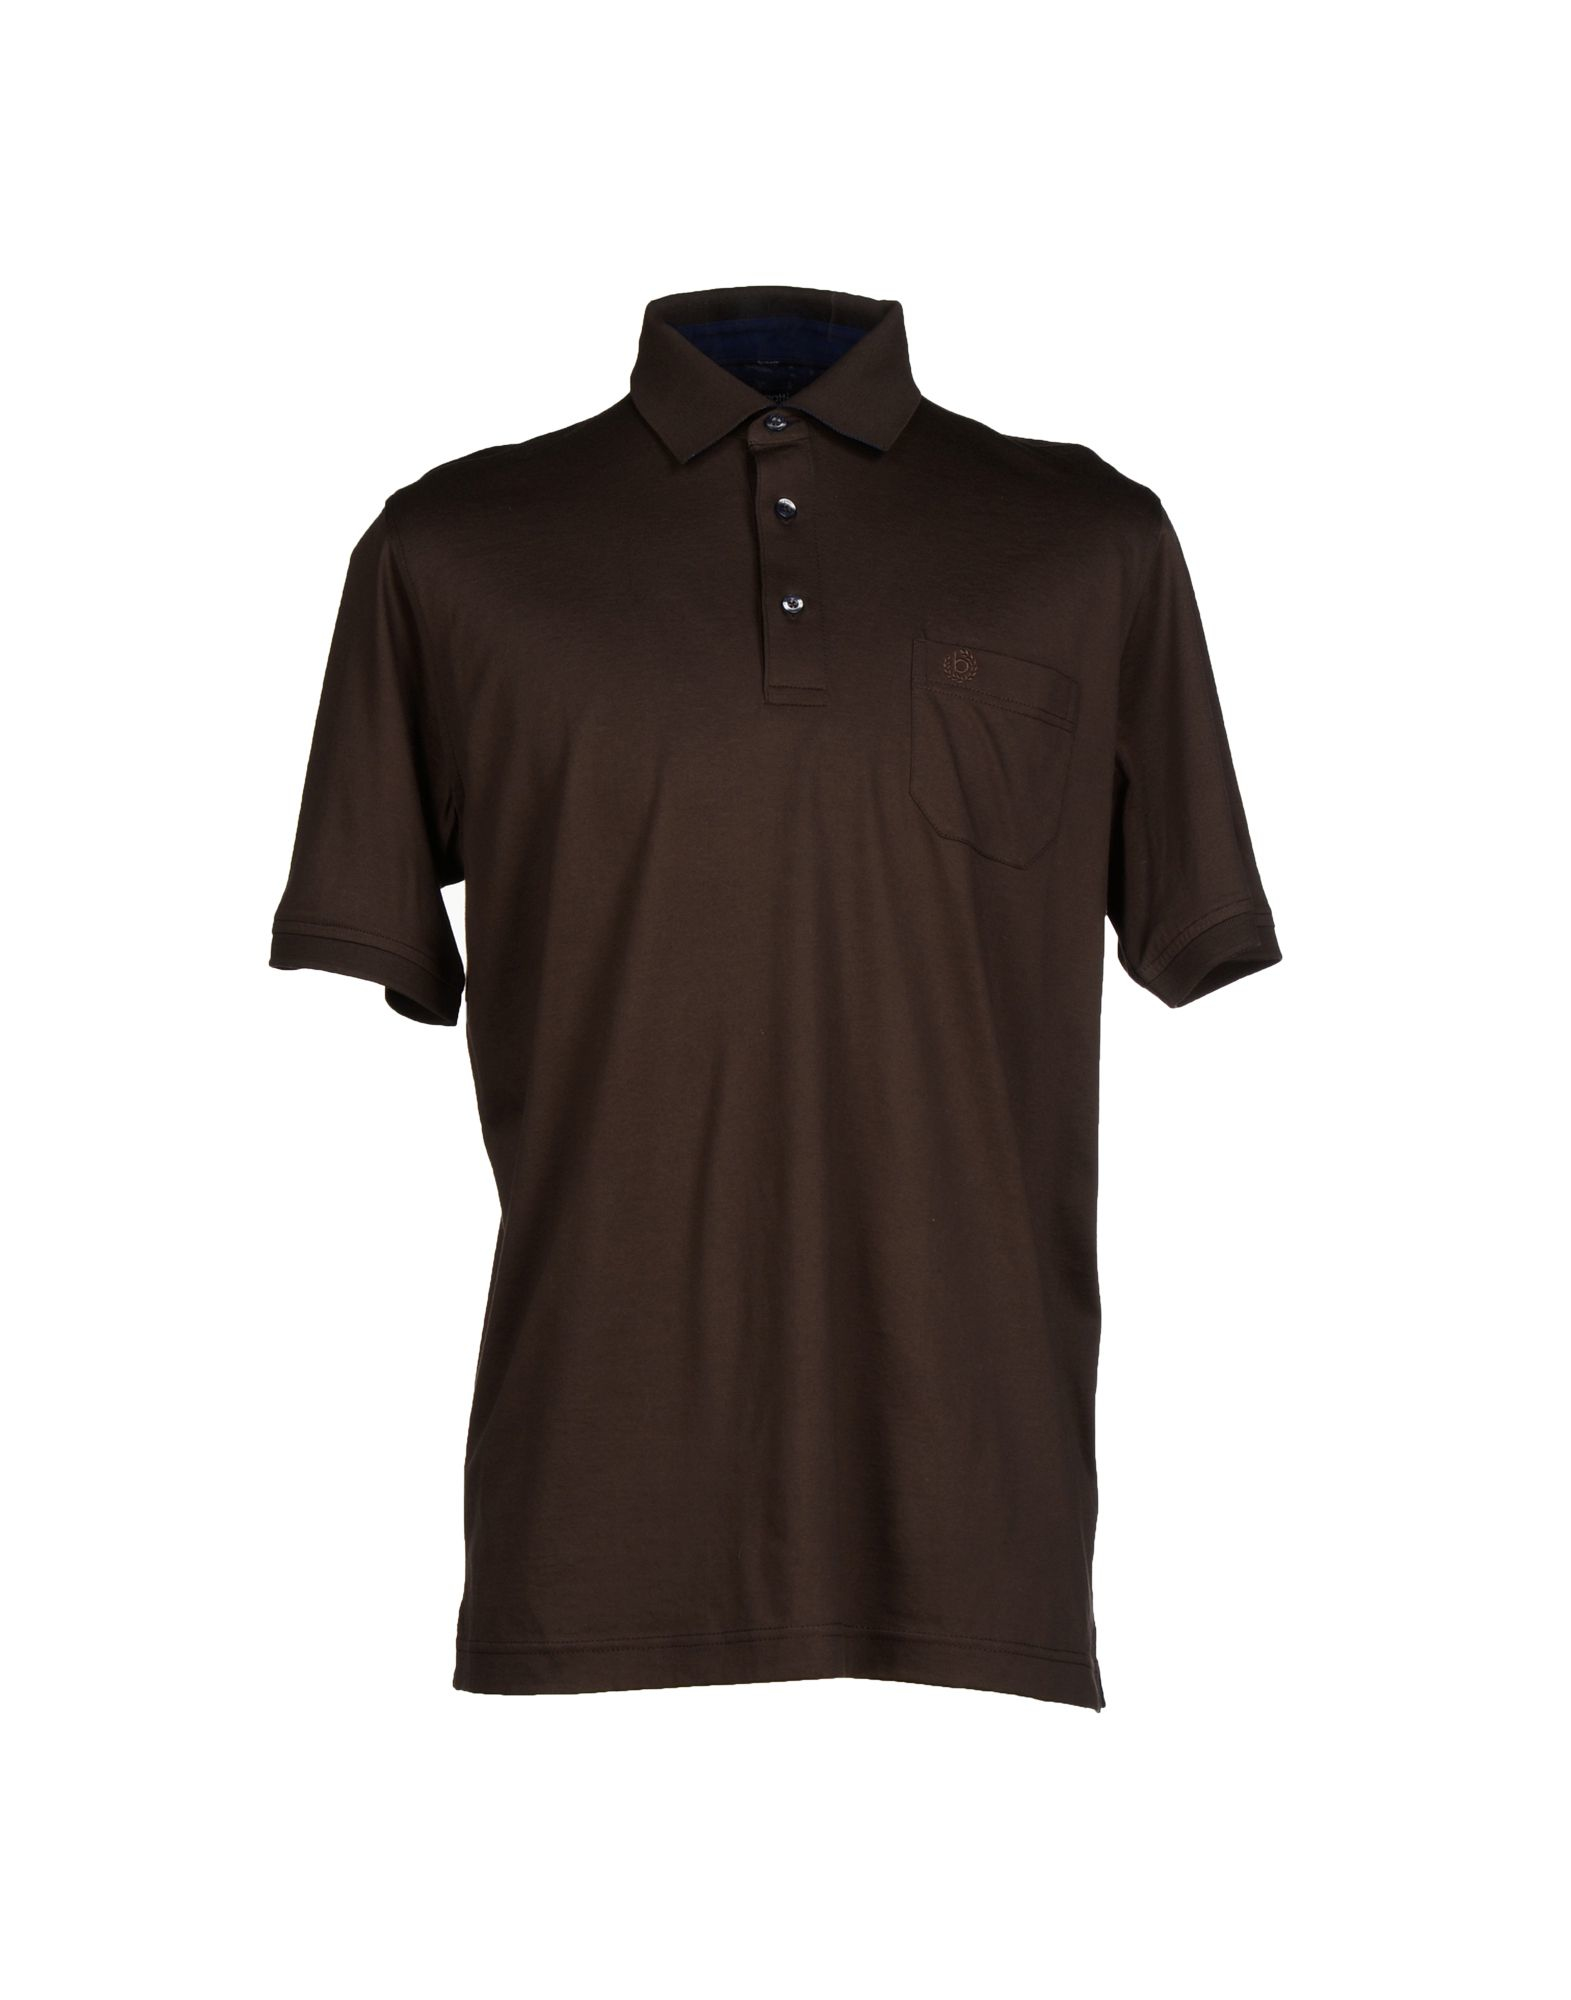 Lyst Bugatti Polo Shirt In Brown For Men